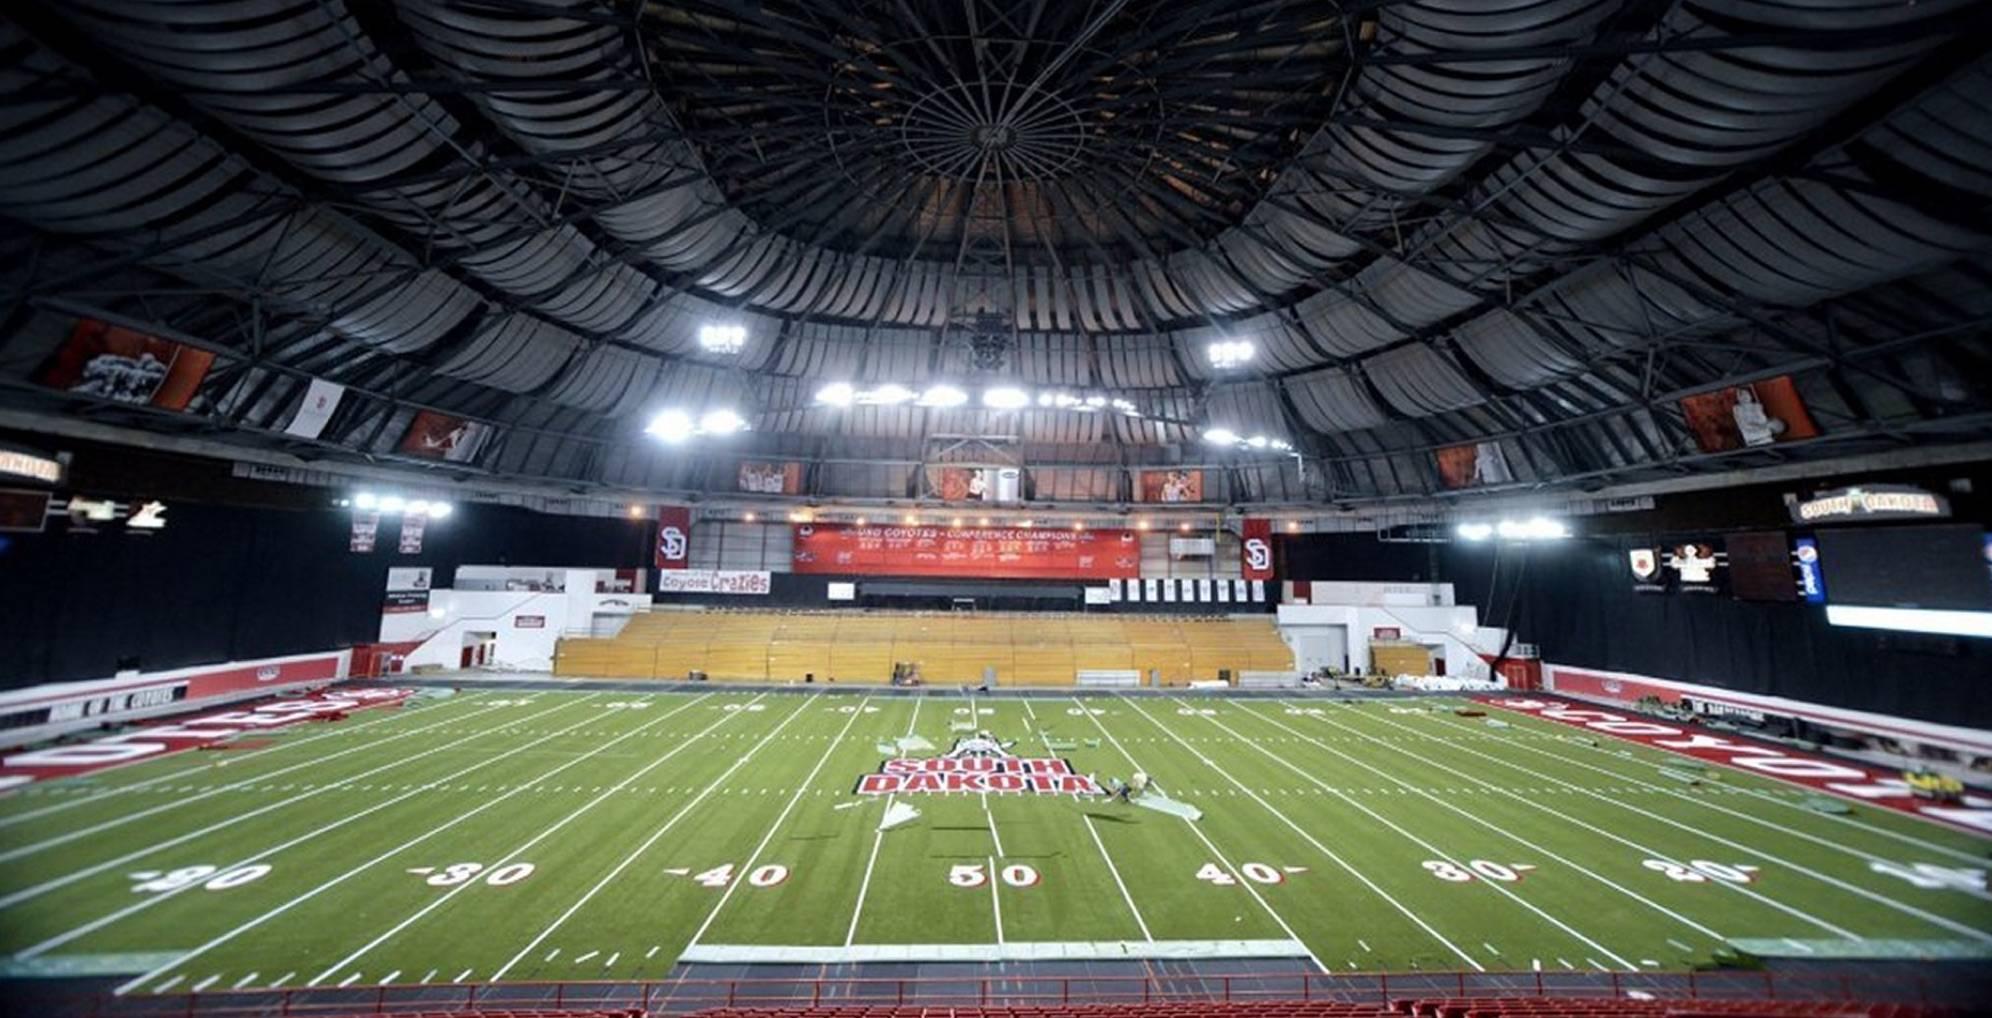 University of South Dakota Dakota Dome